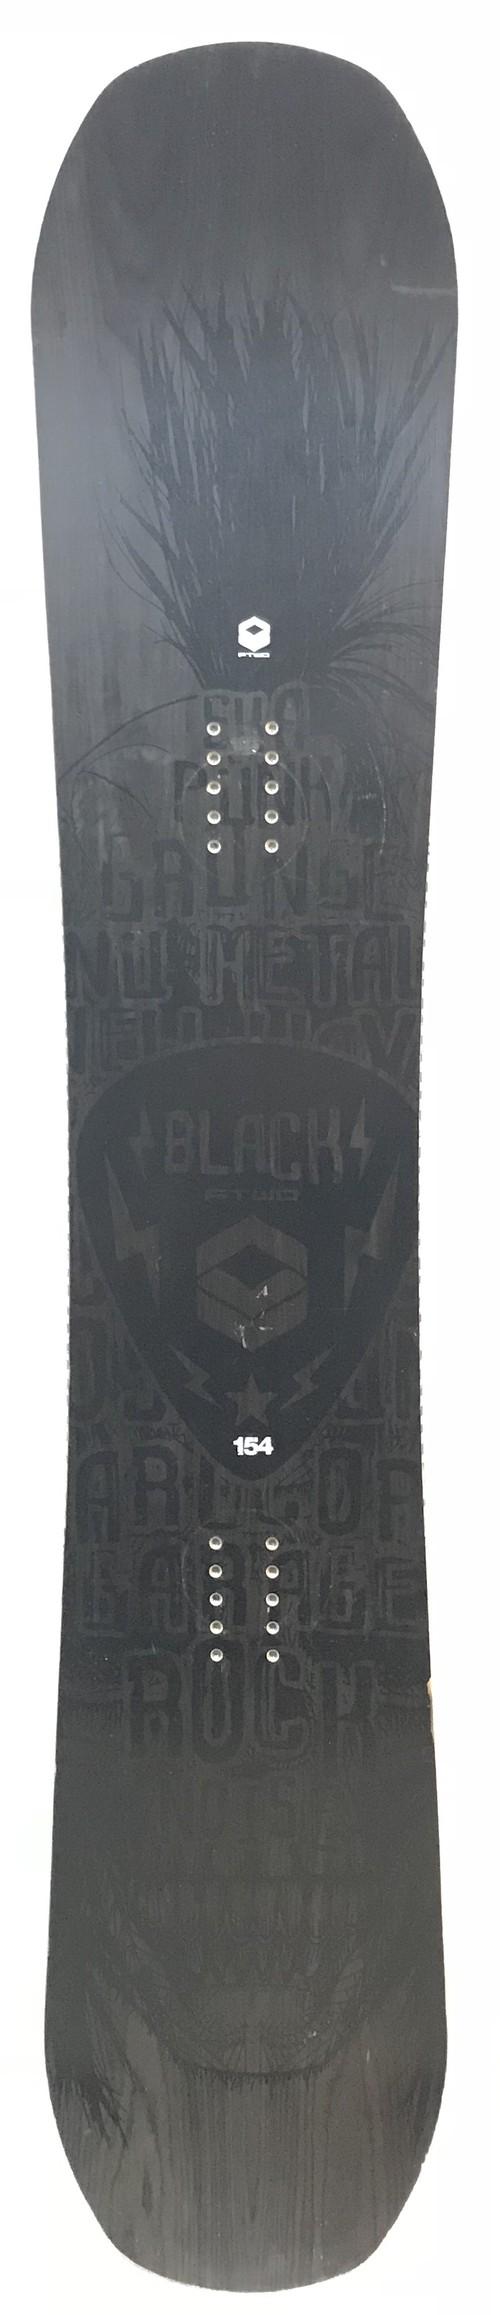 【FTWO-BLACKDECK LTD 150】1ヶ月レンタルプラン